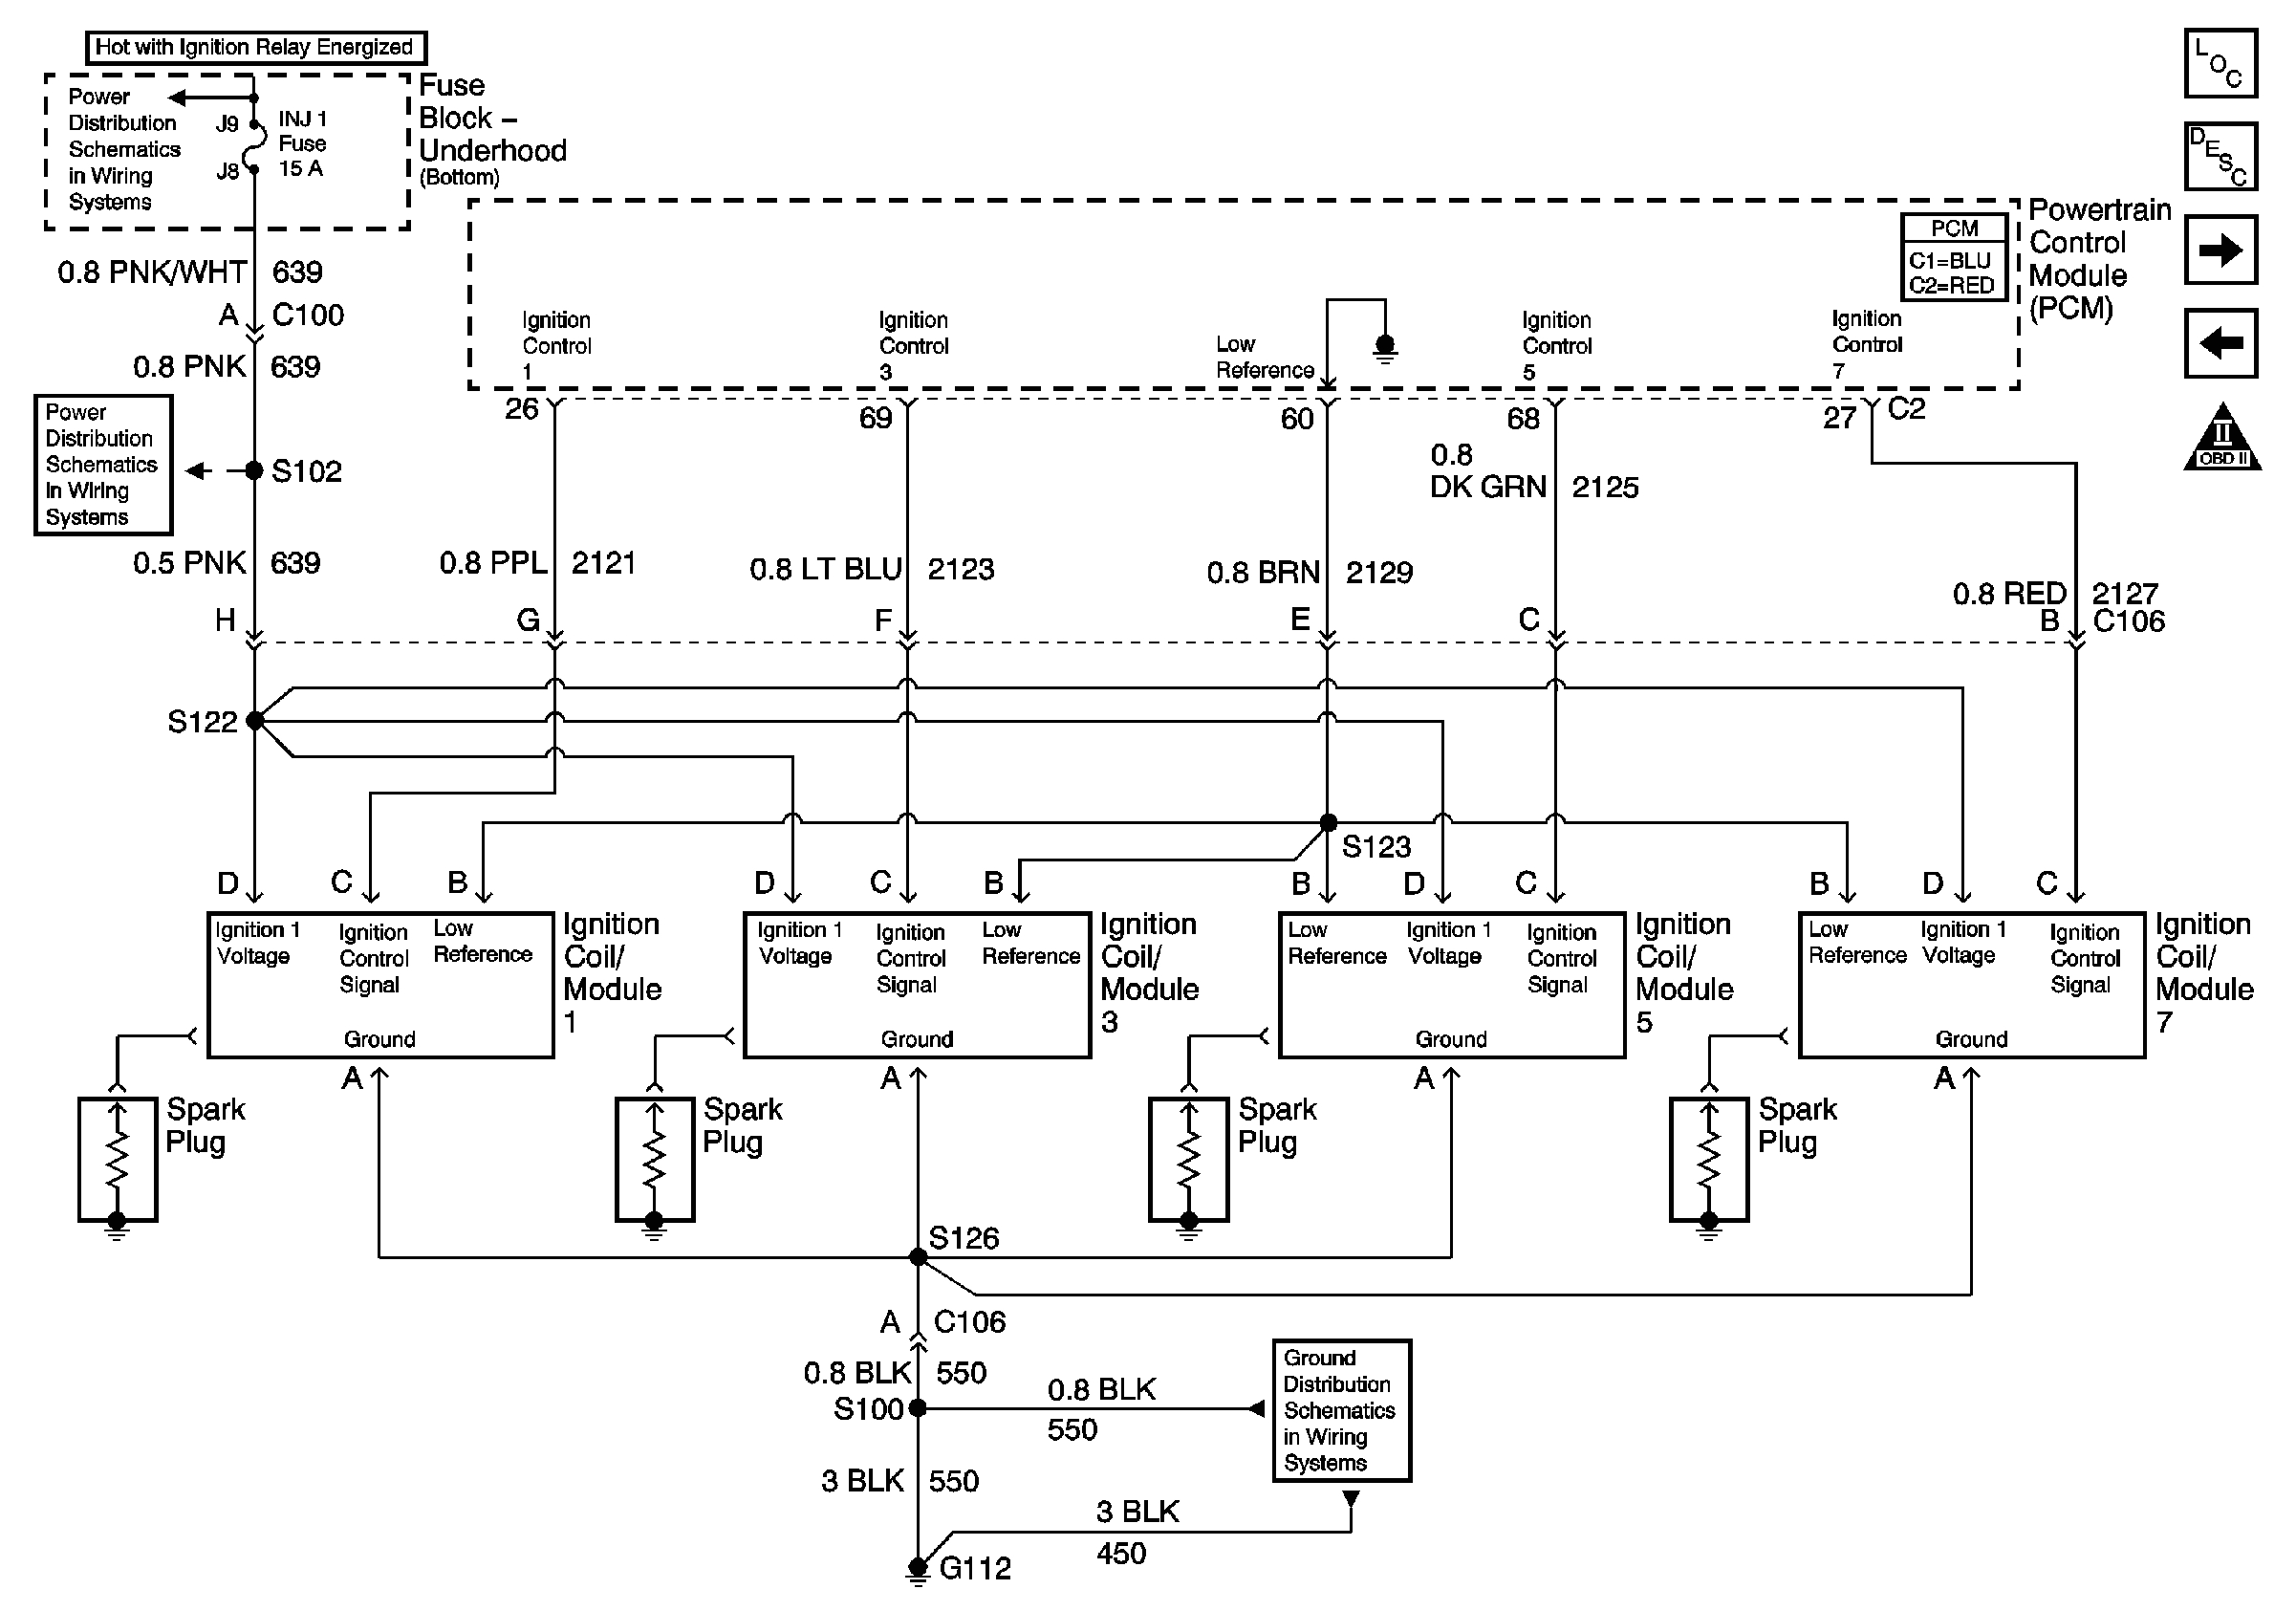 ls3 engine controls wiring diagram data schematic diagram gm ls3 wiring diagram